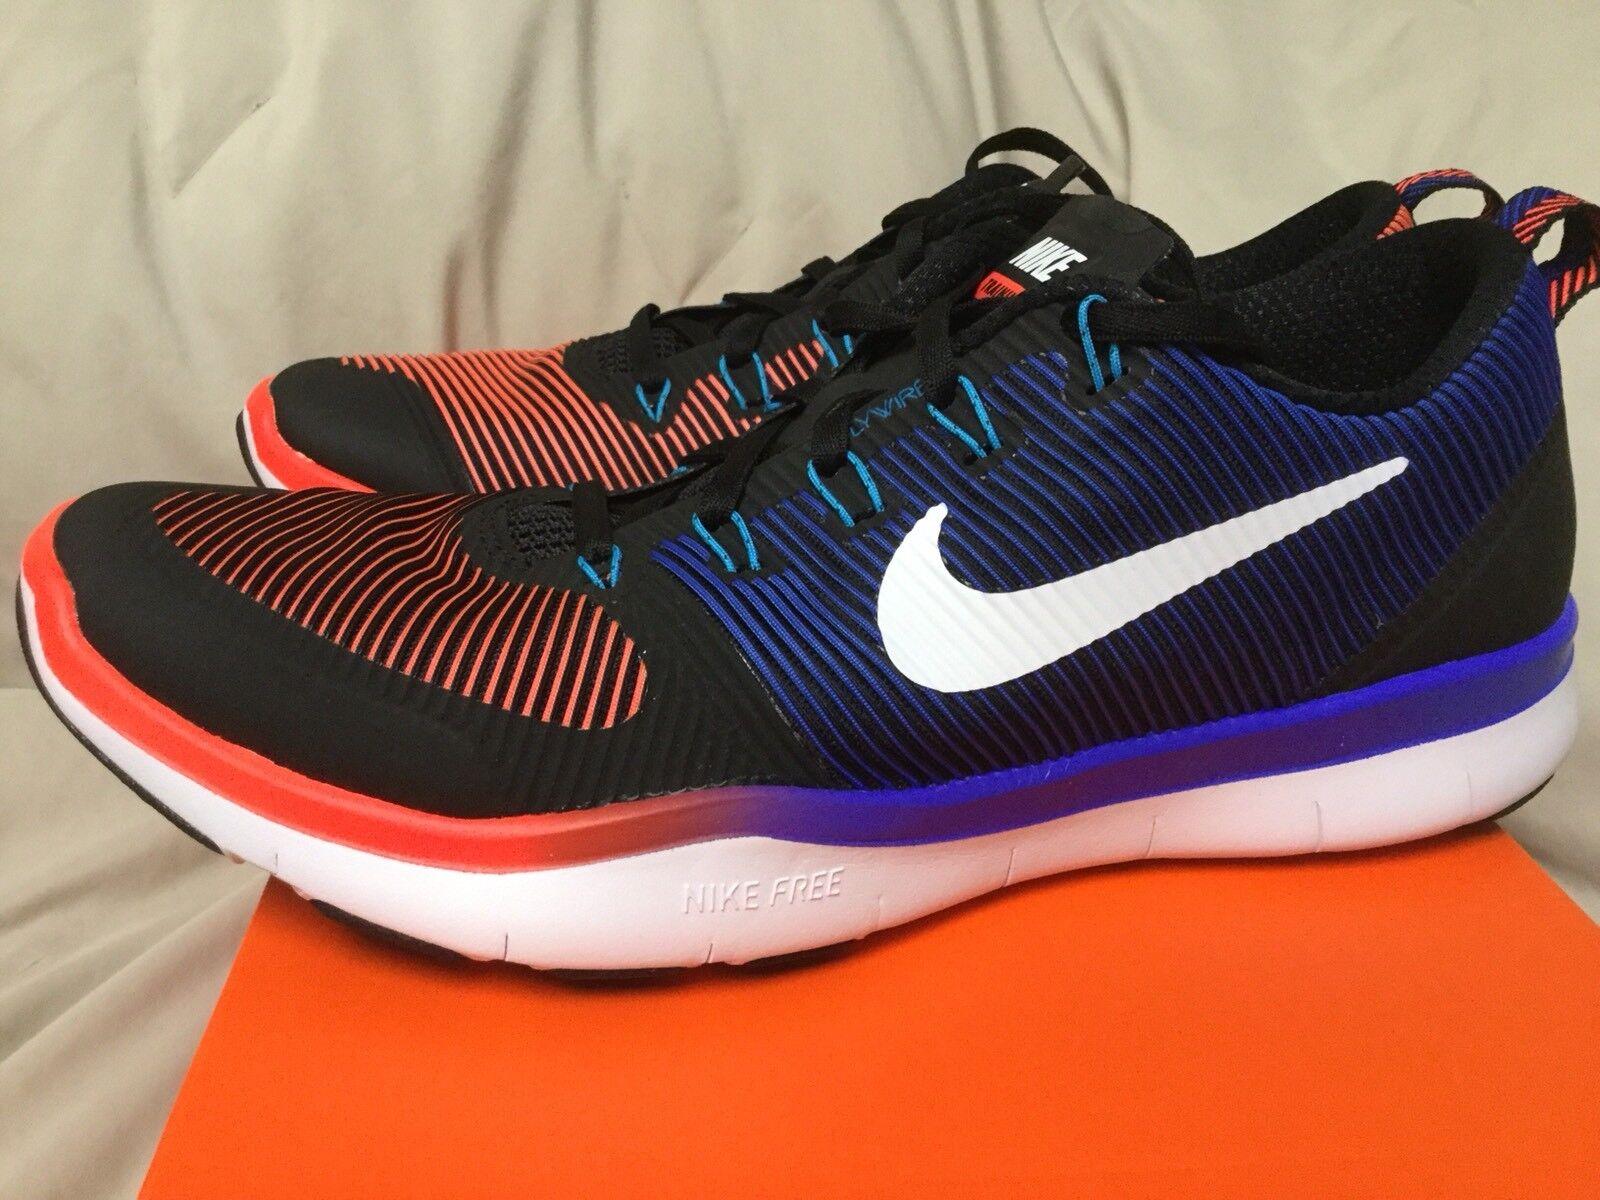 Nike Mens Free Train Versatility NEW Size 11.5